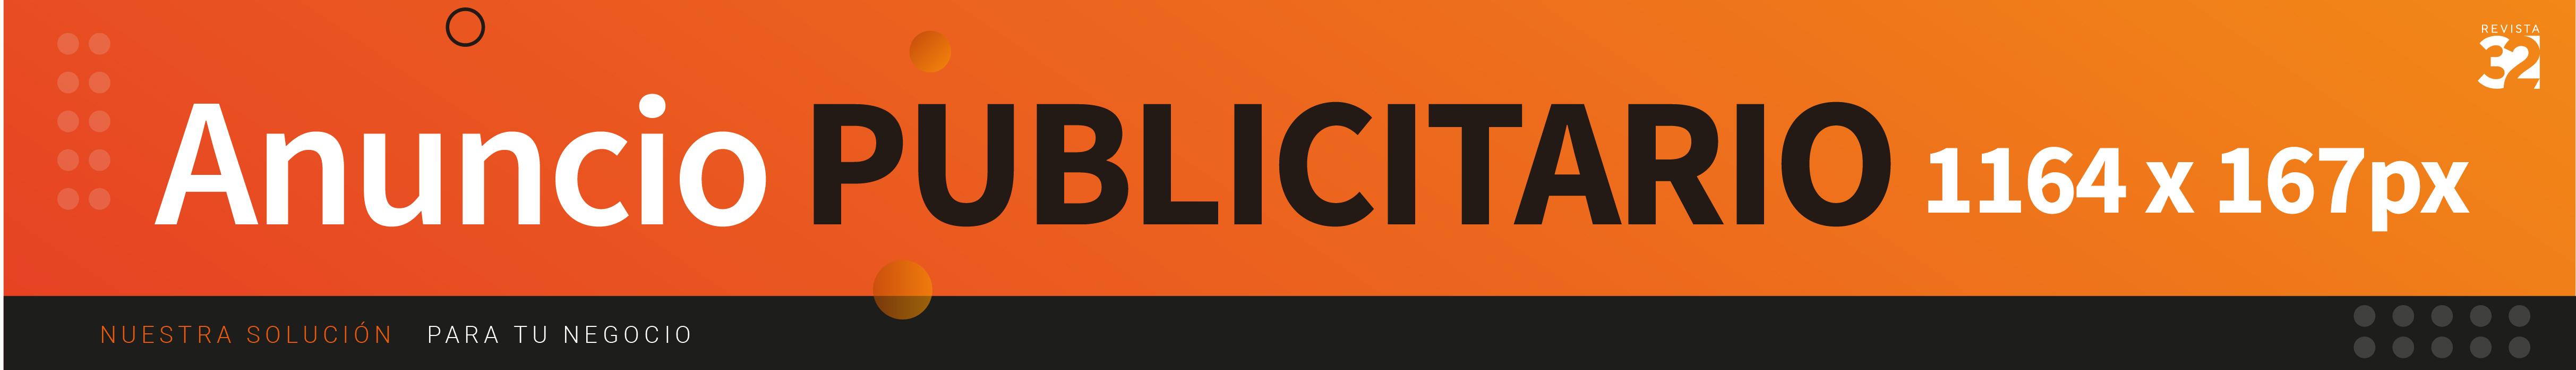 Banner 1164 x 167- Ejemplo